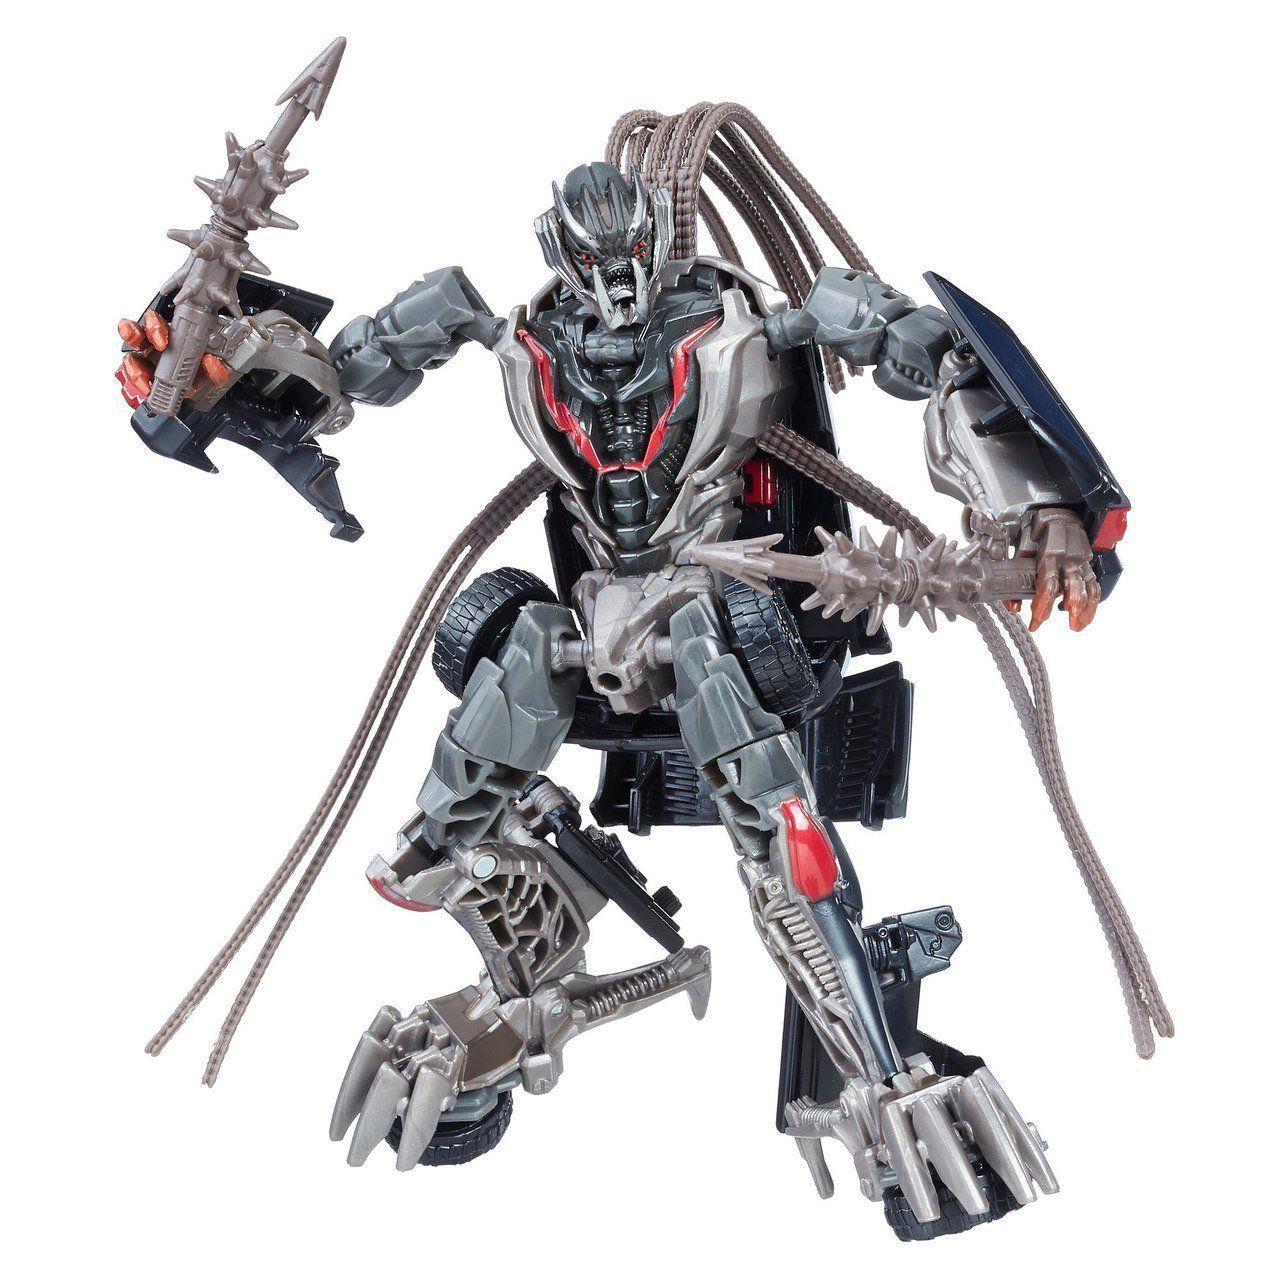 Boneco Crowbar: Transformers - Hasbro